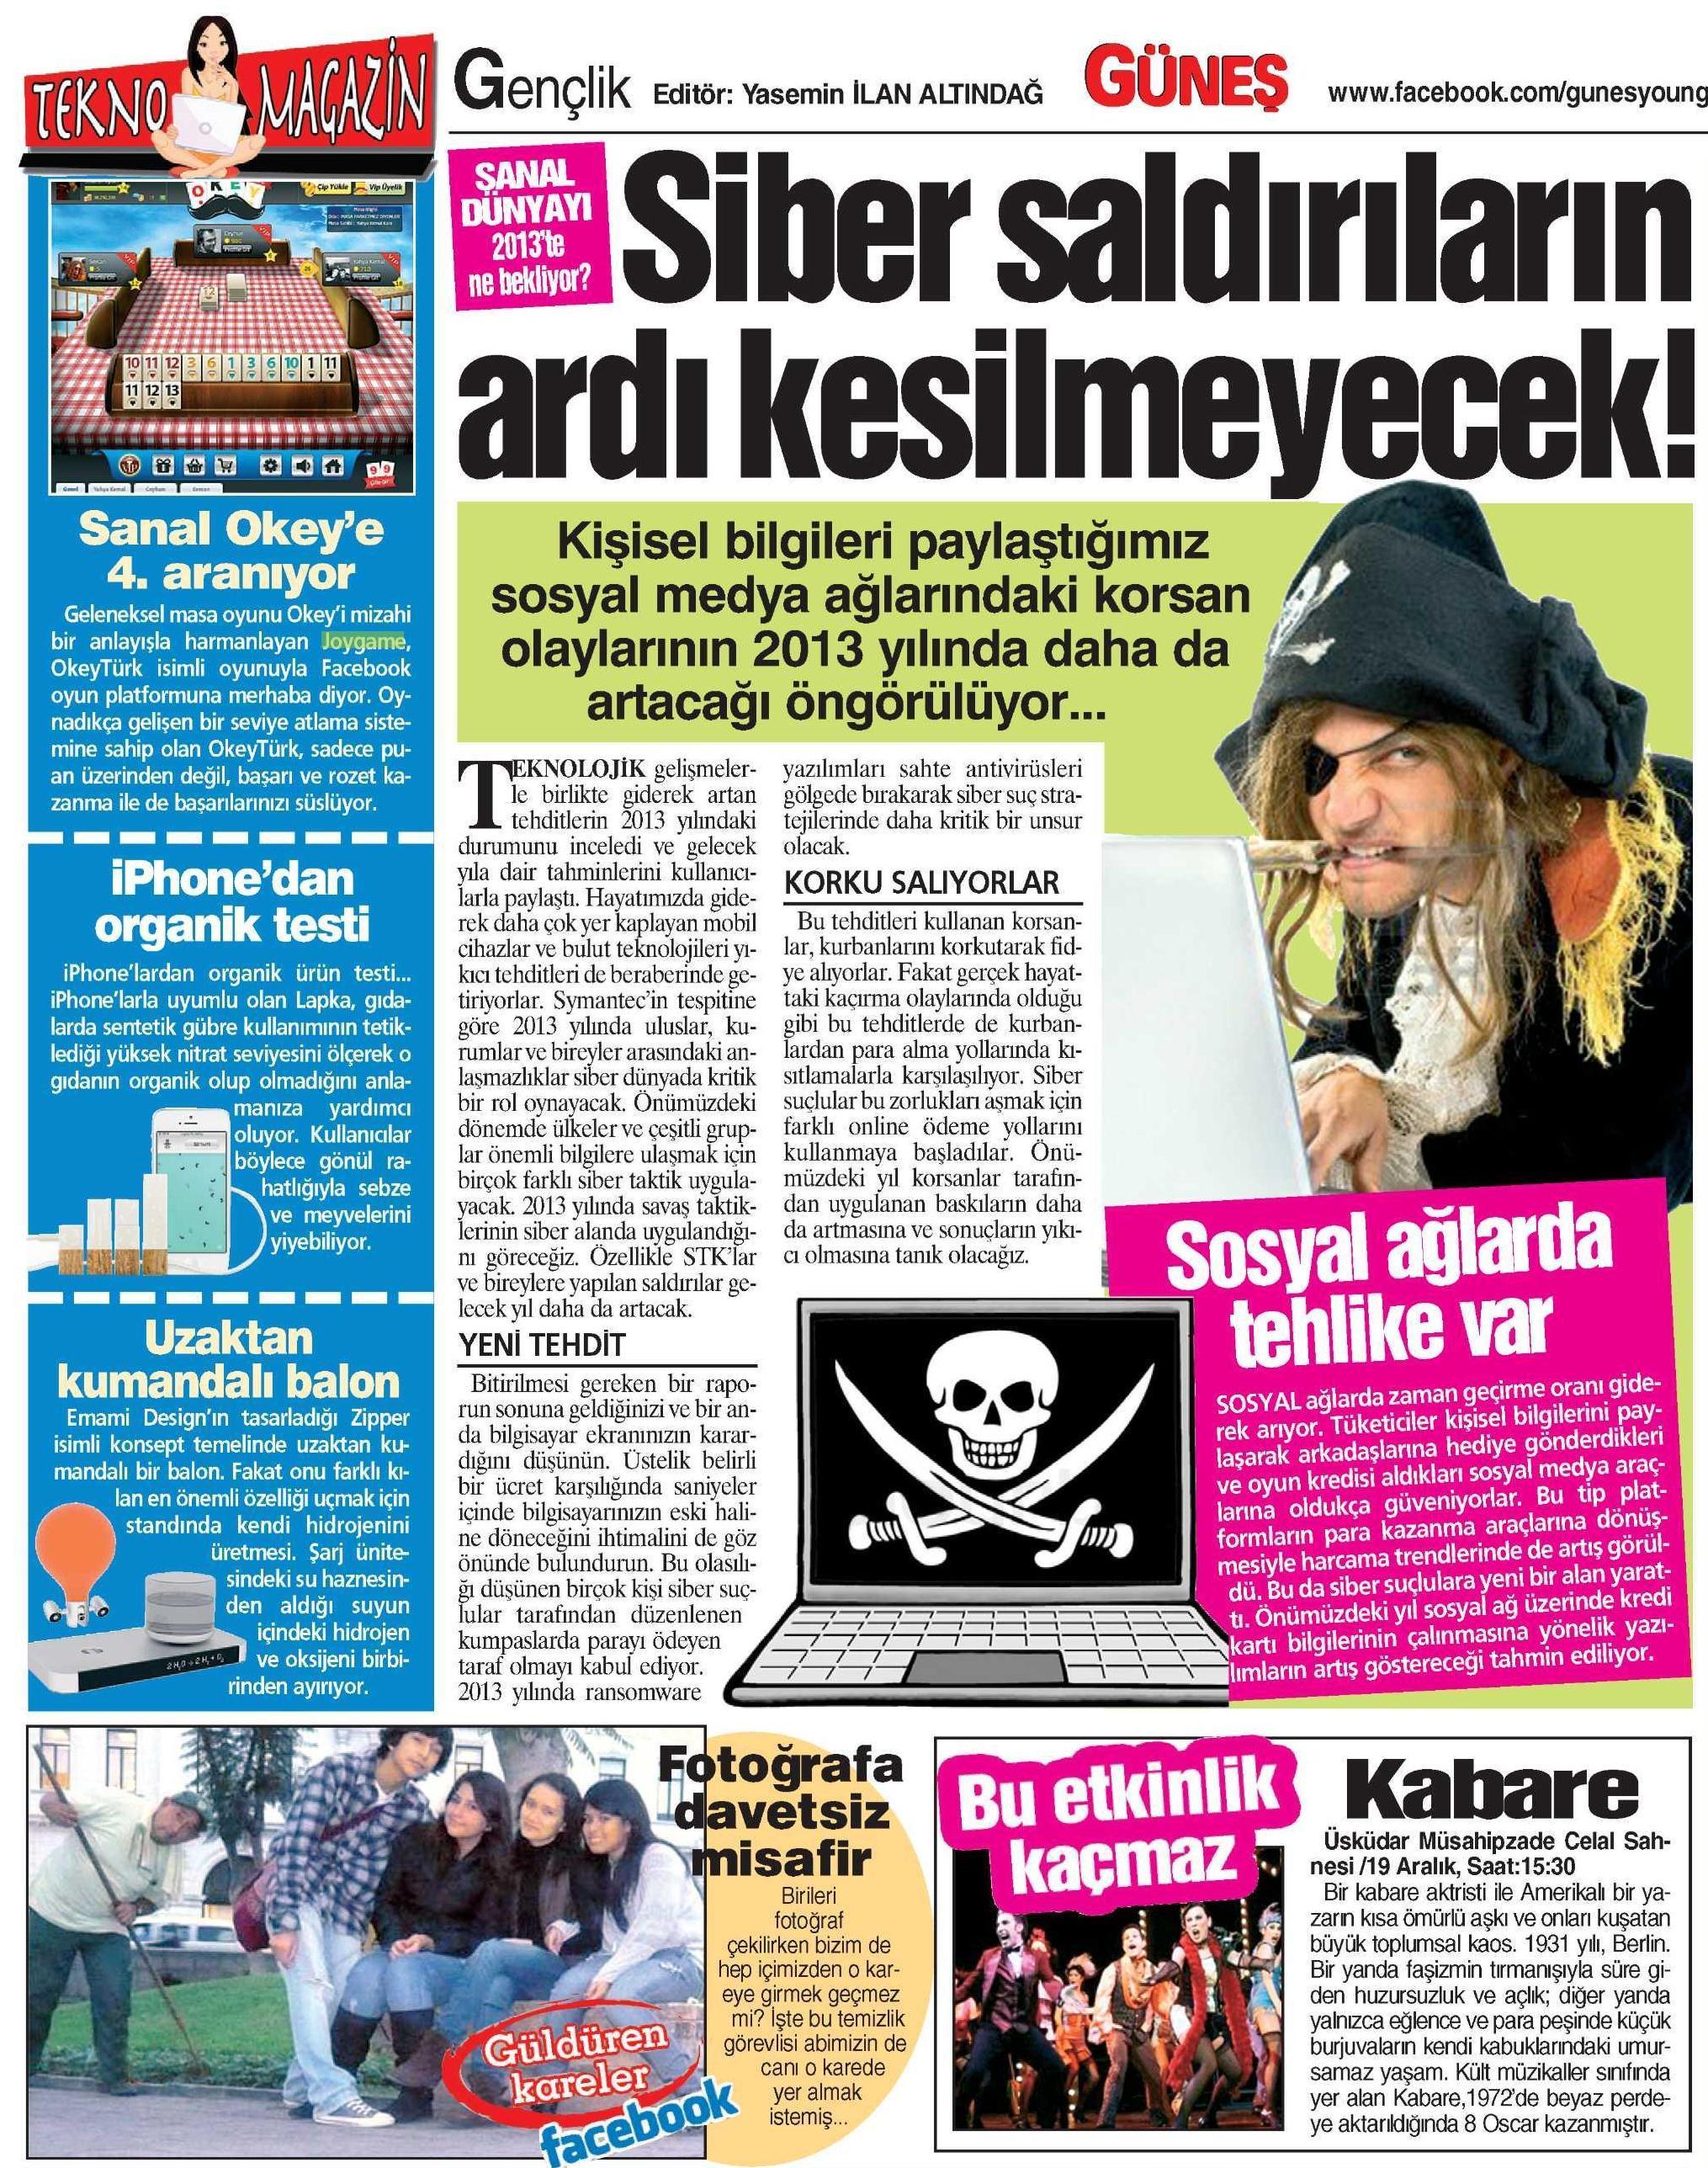 Netmarble-Turkey-Gunes-Gazetesi-15-Aralik-2012-Sayfa-9